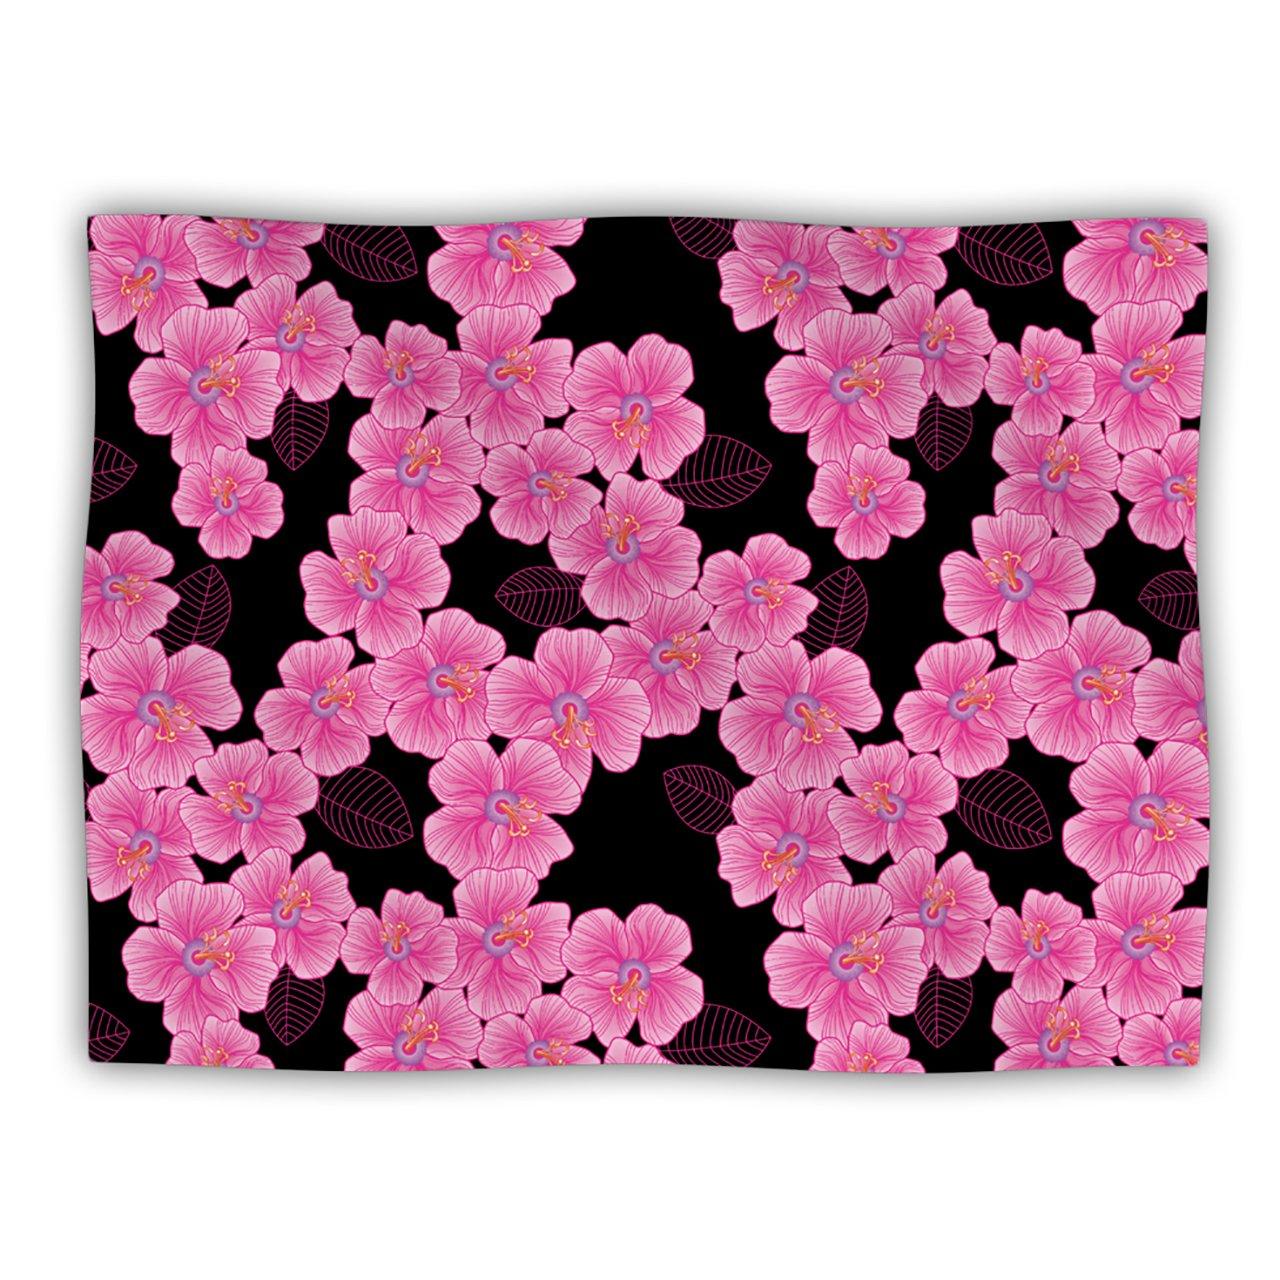 Kess InHouse Julia Grifol Pink on Black  Dog Blanket, 60 by 50-Inch